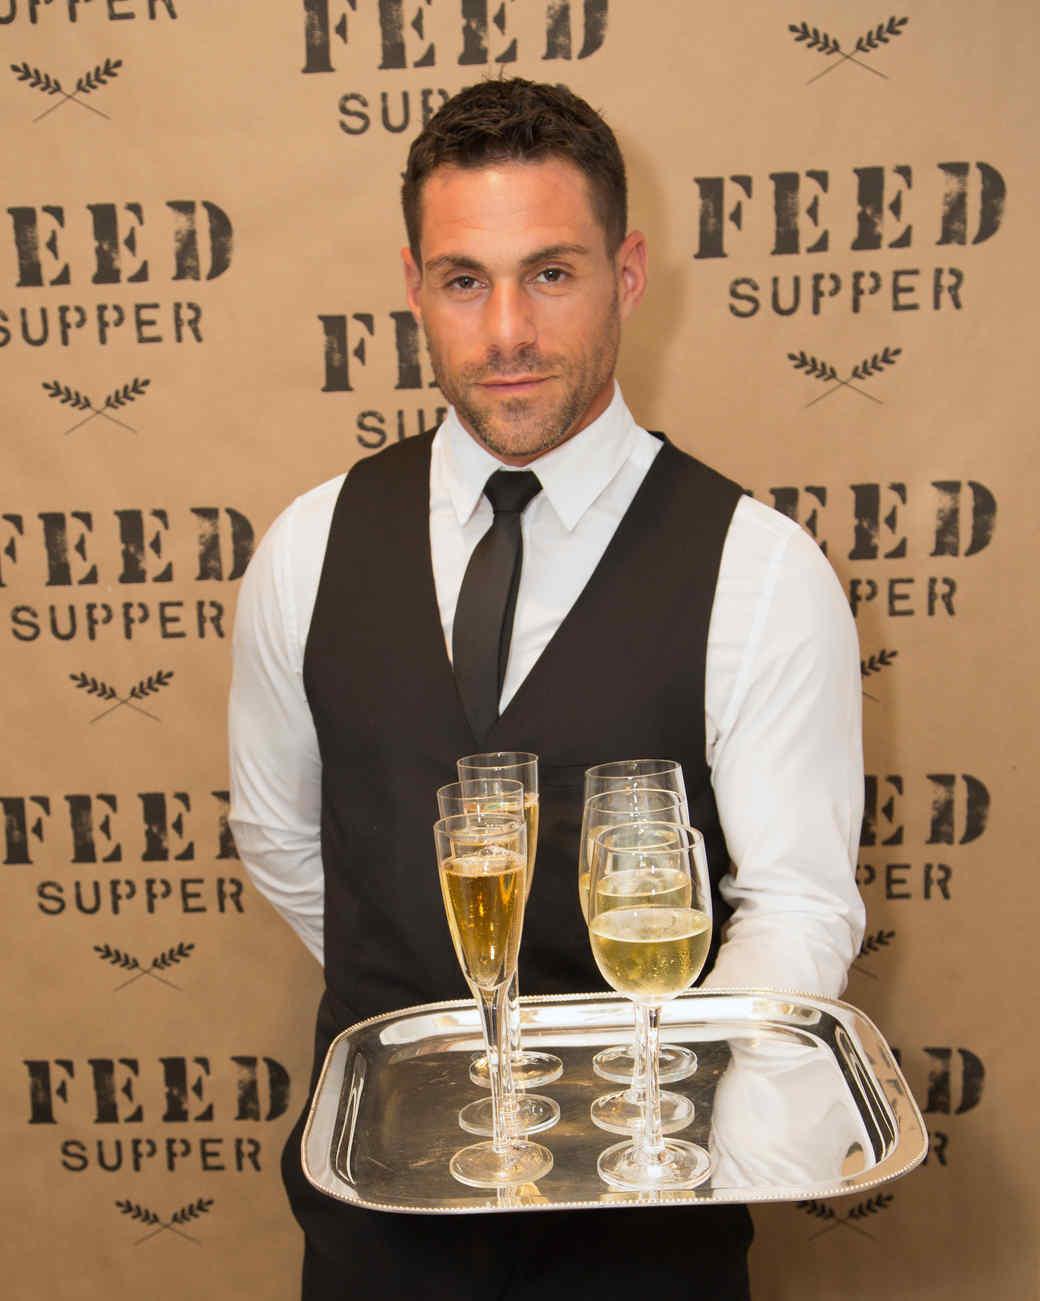 feed-supper-1-1015.jpg